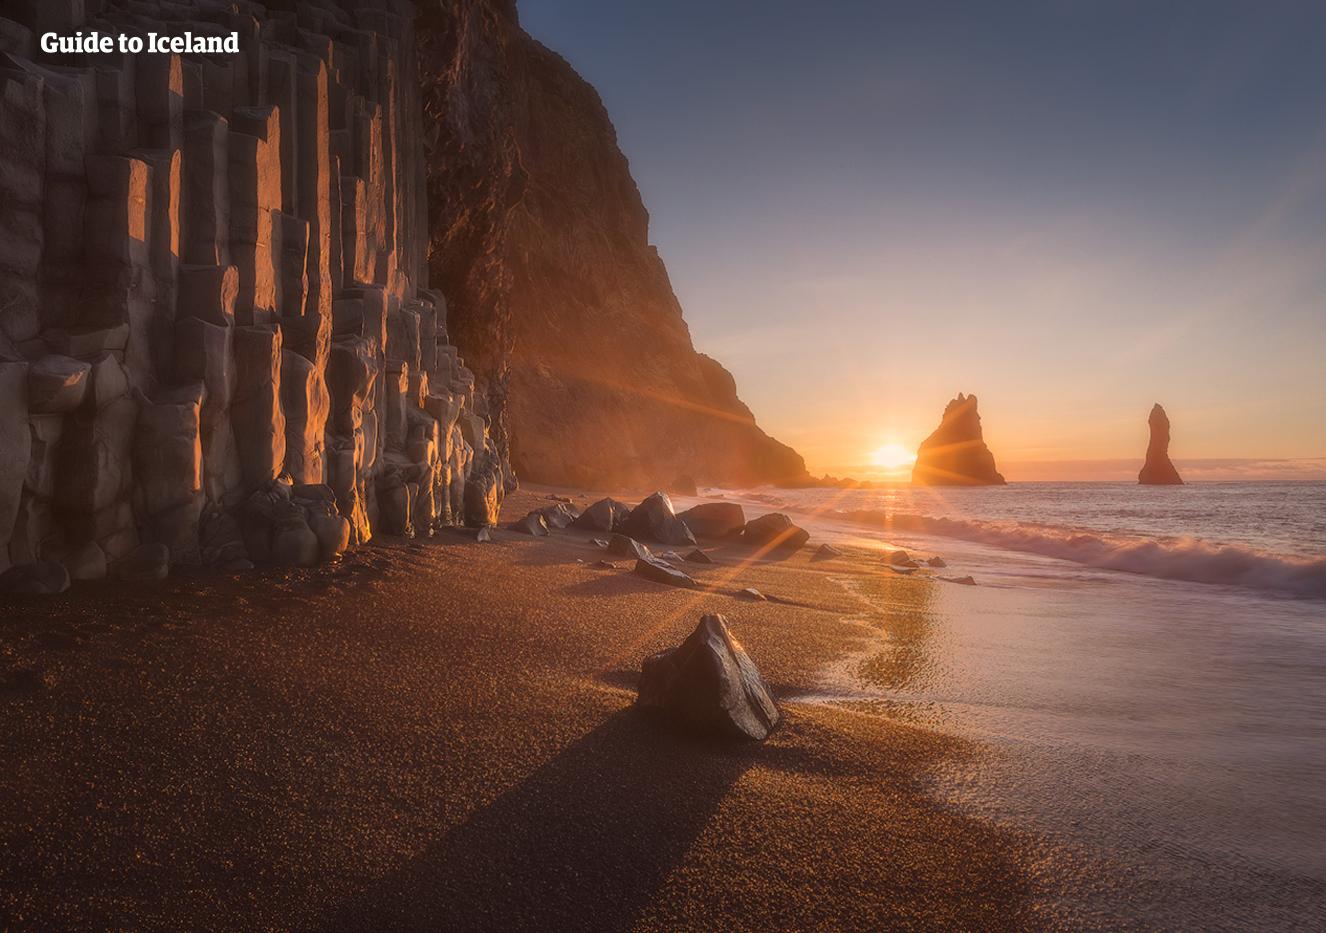 La plage de sable noir de Reynisfjara est une attraction incontournable sur la côte sud de l'Islande.